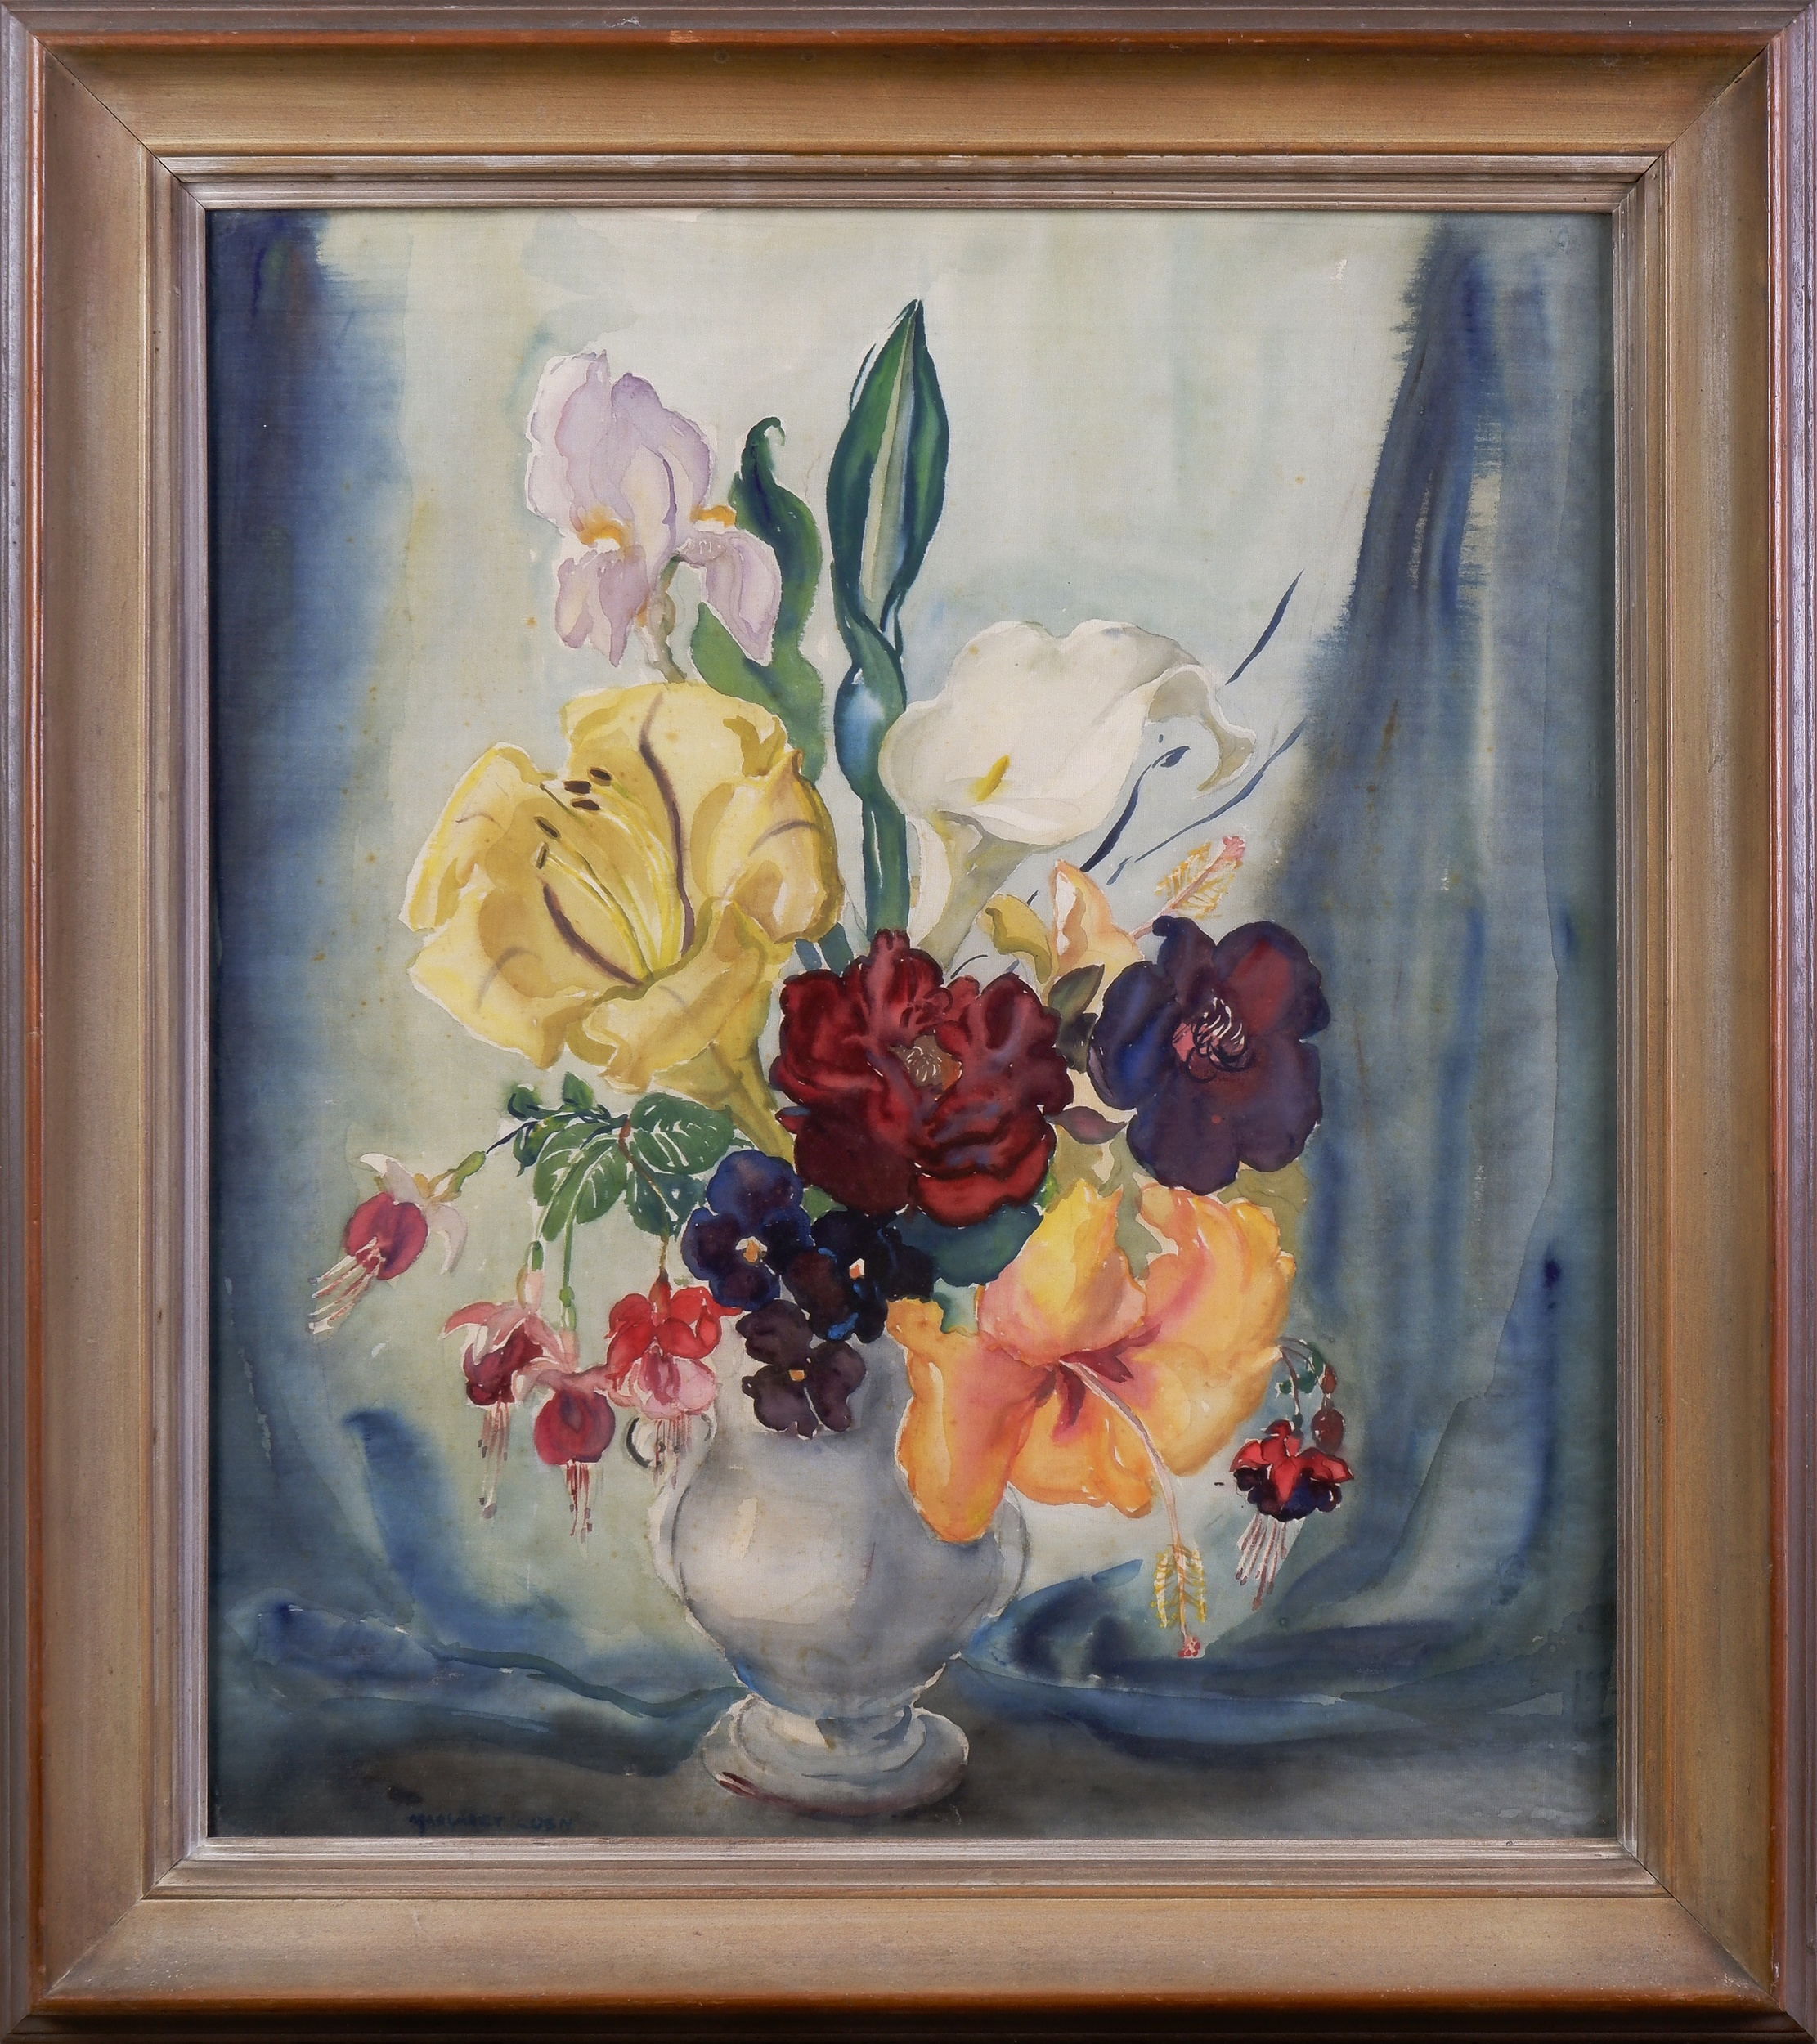 'Margaret Coen (1913-1993), Untitled (Still-Life) Watercolour on Silk, 48 x 42 cm'